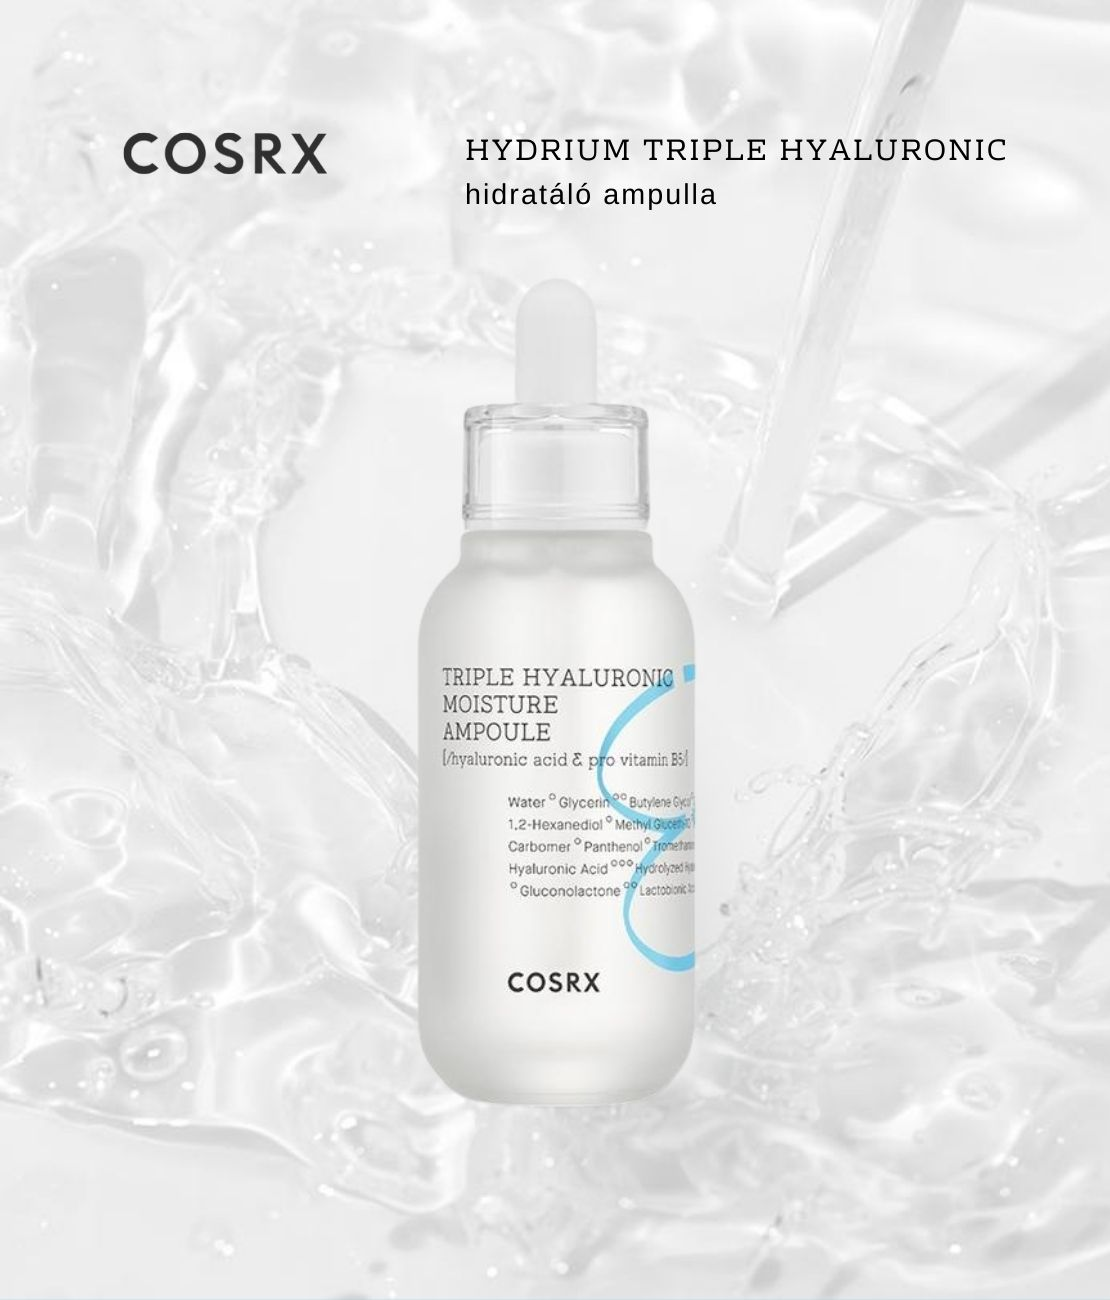 COSRX-Hydrium-triple-hyaluronic-hidratalo-ampulla-des